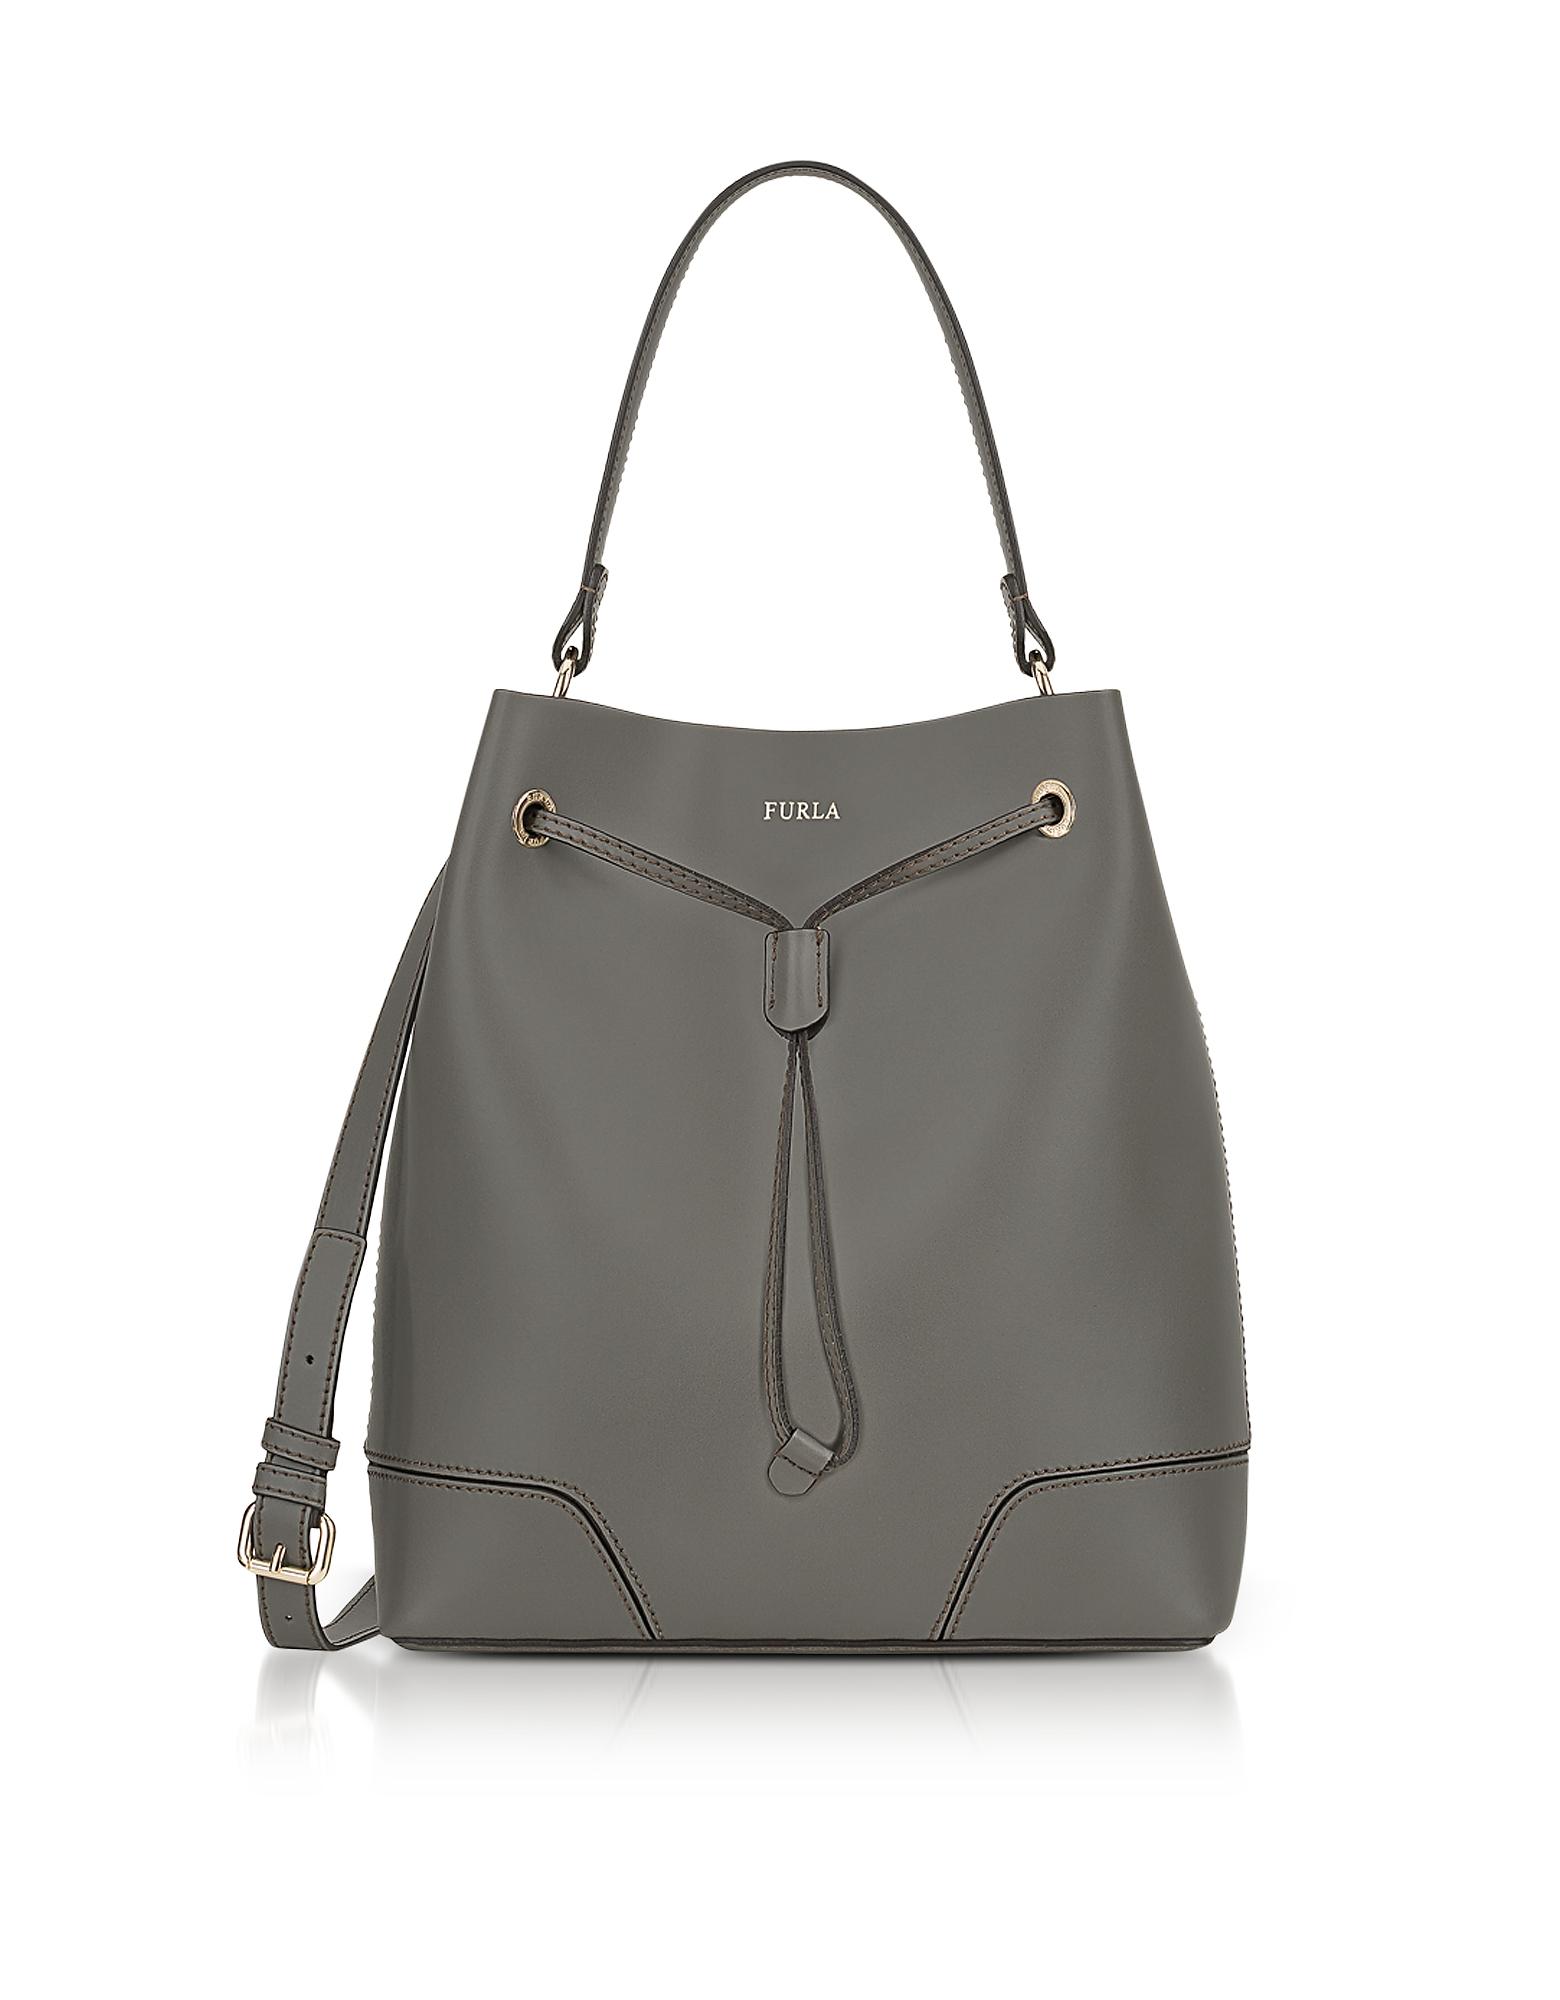 Furla Handbags, Stacy M Argilla Leather Bucket Bag